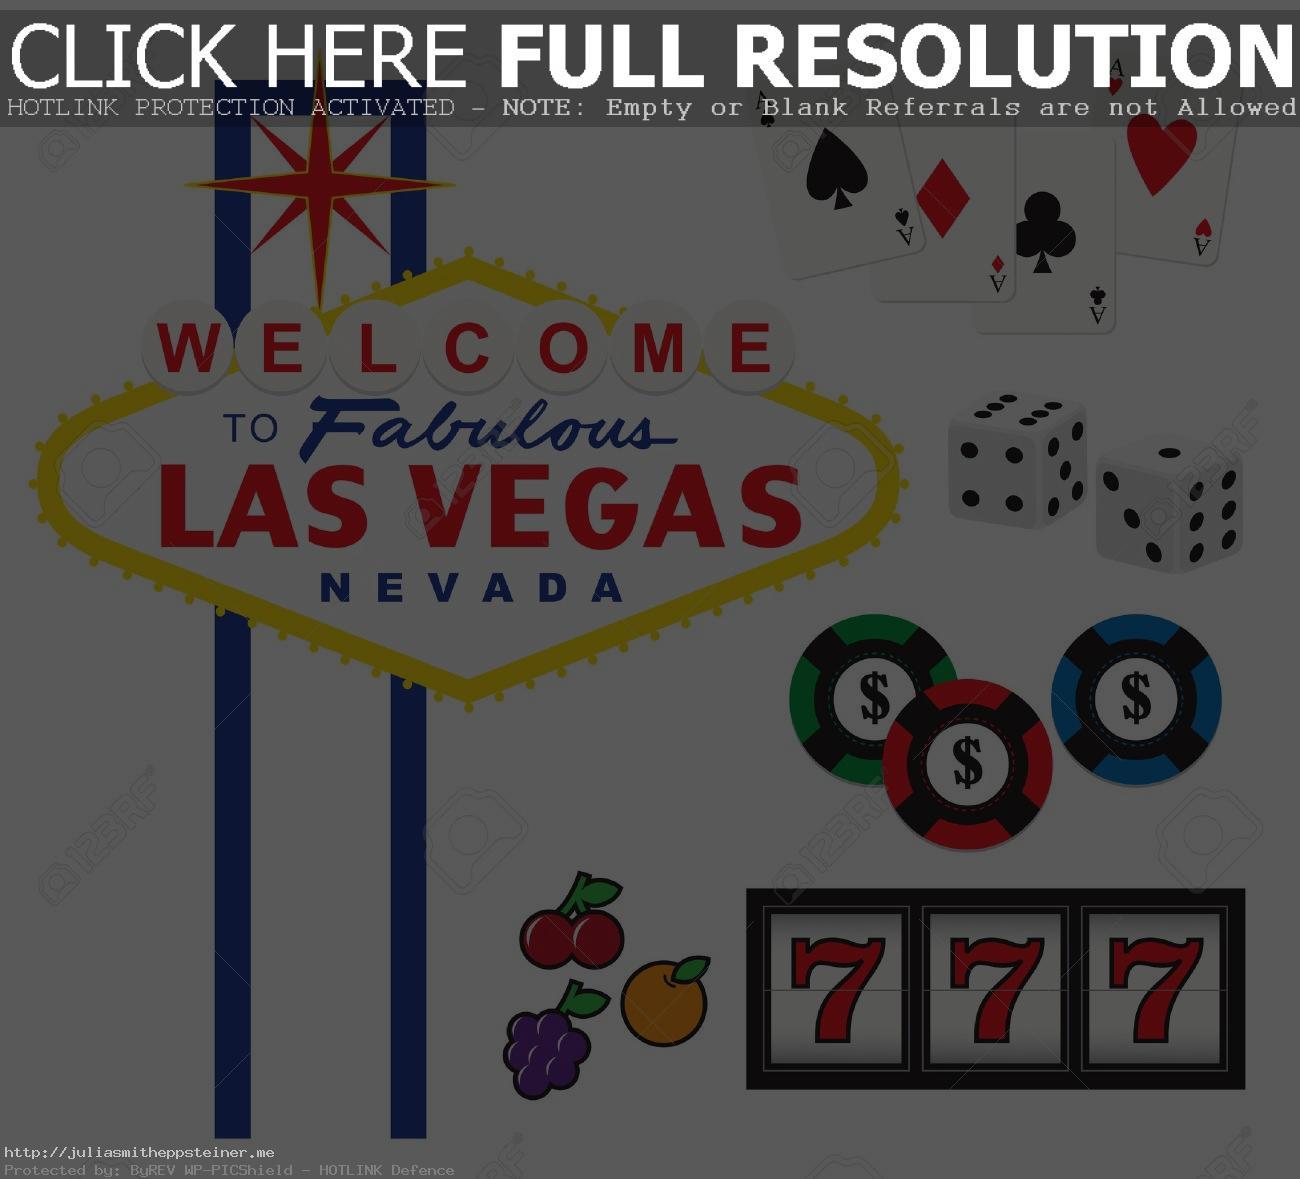 Stylish Free Las Vegas Clip Art Clipart Clipground 2018 ClipartLook.com